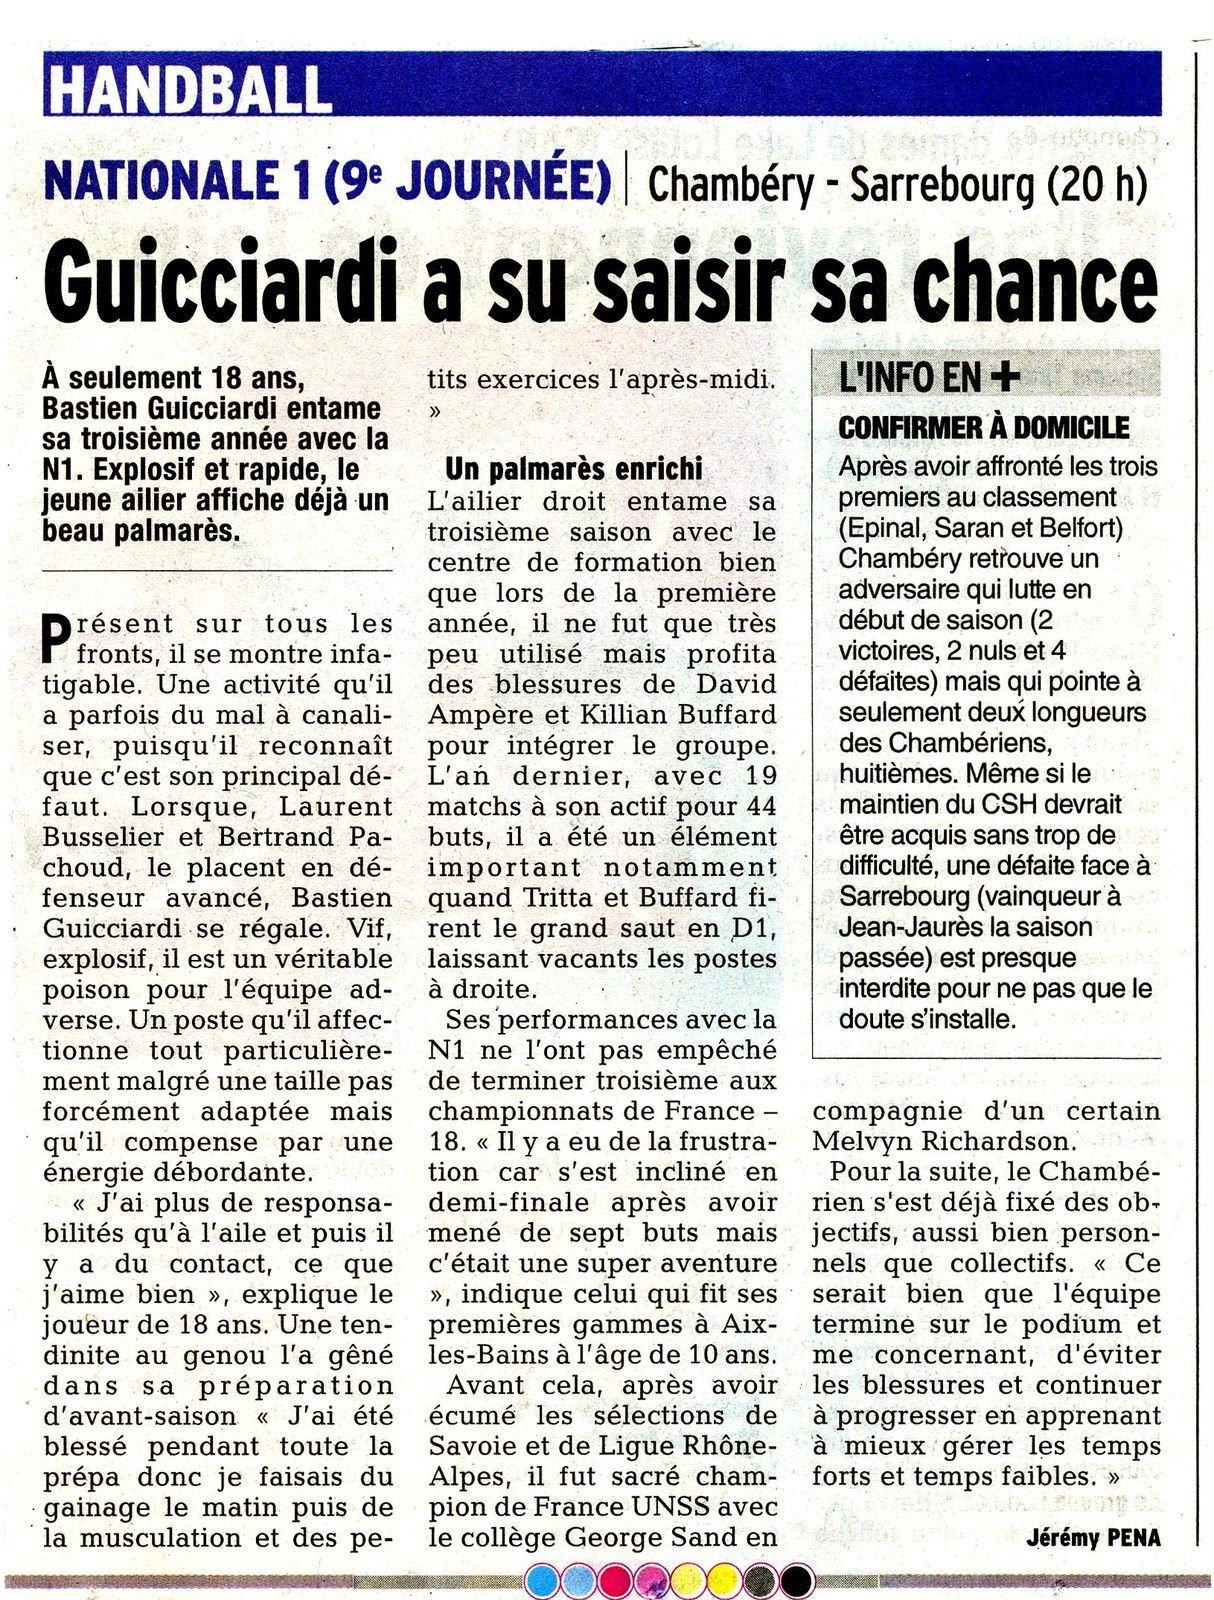 Article Jérémy PENA / Photo : JP Riboli